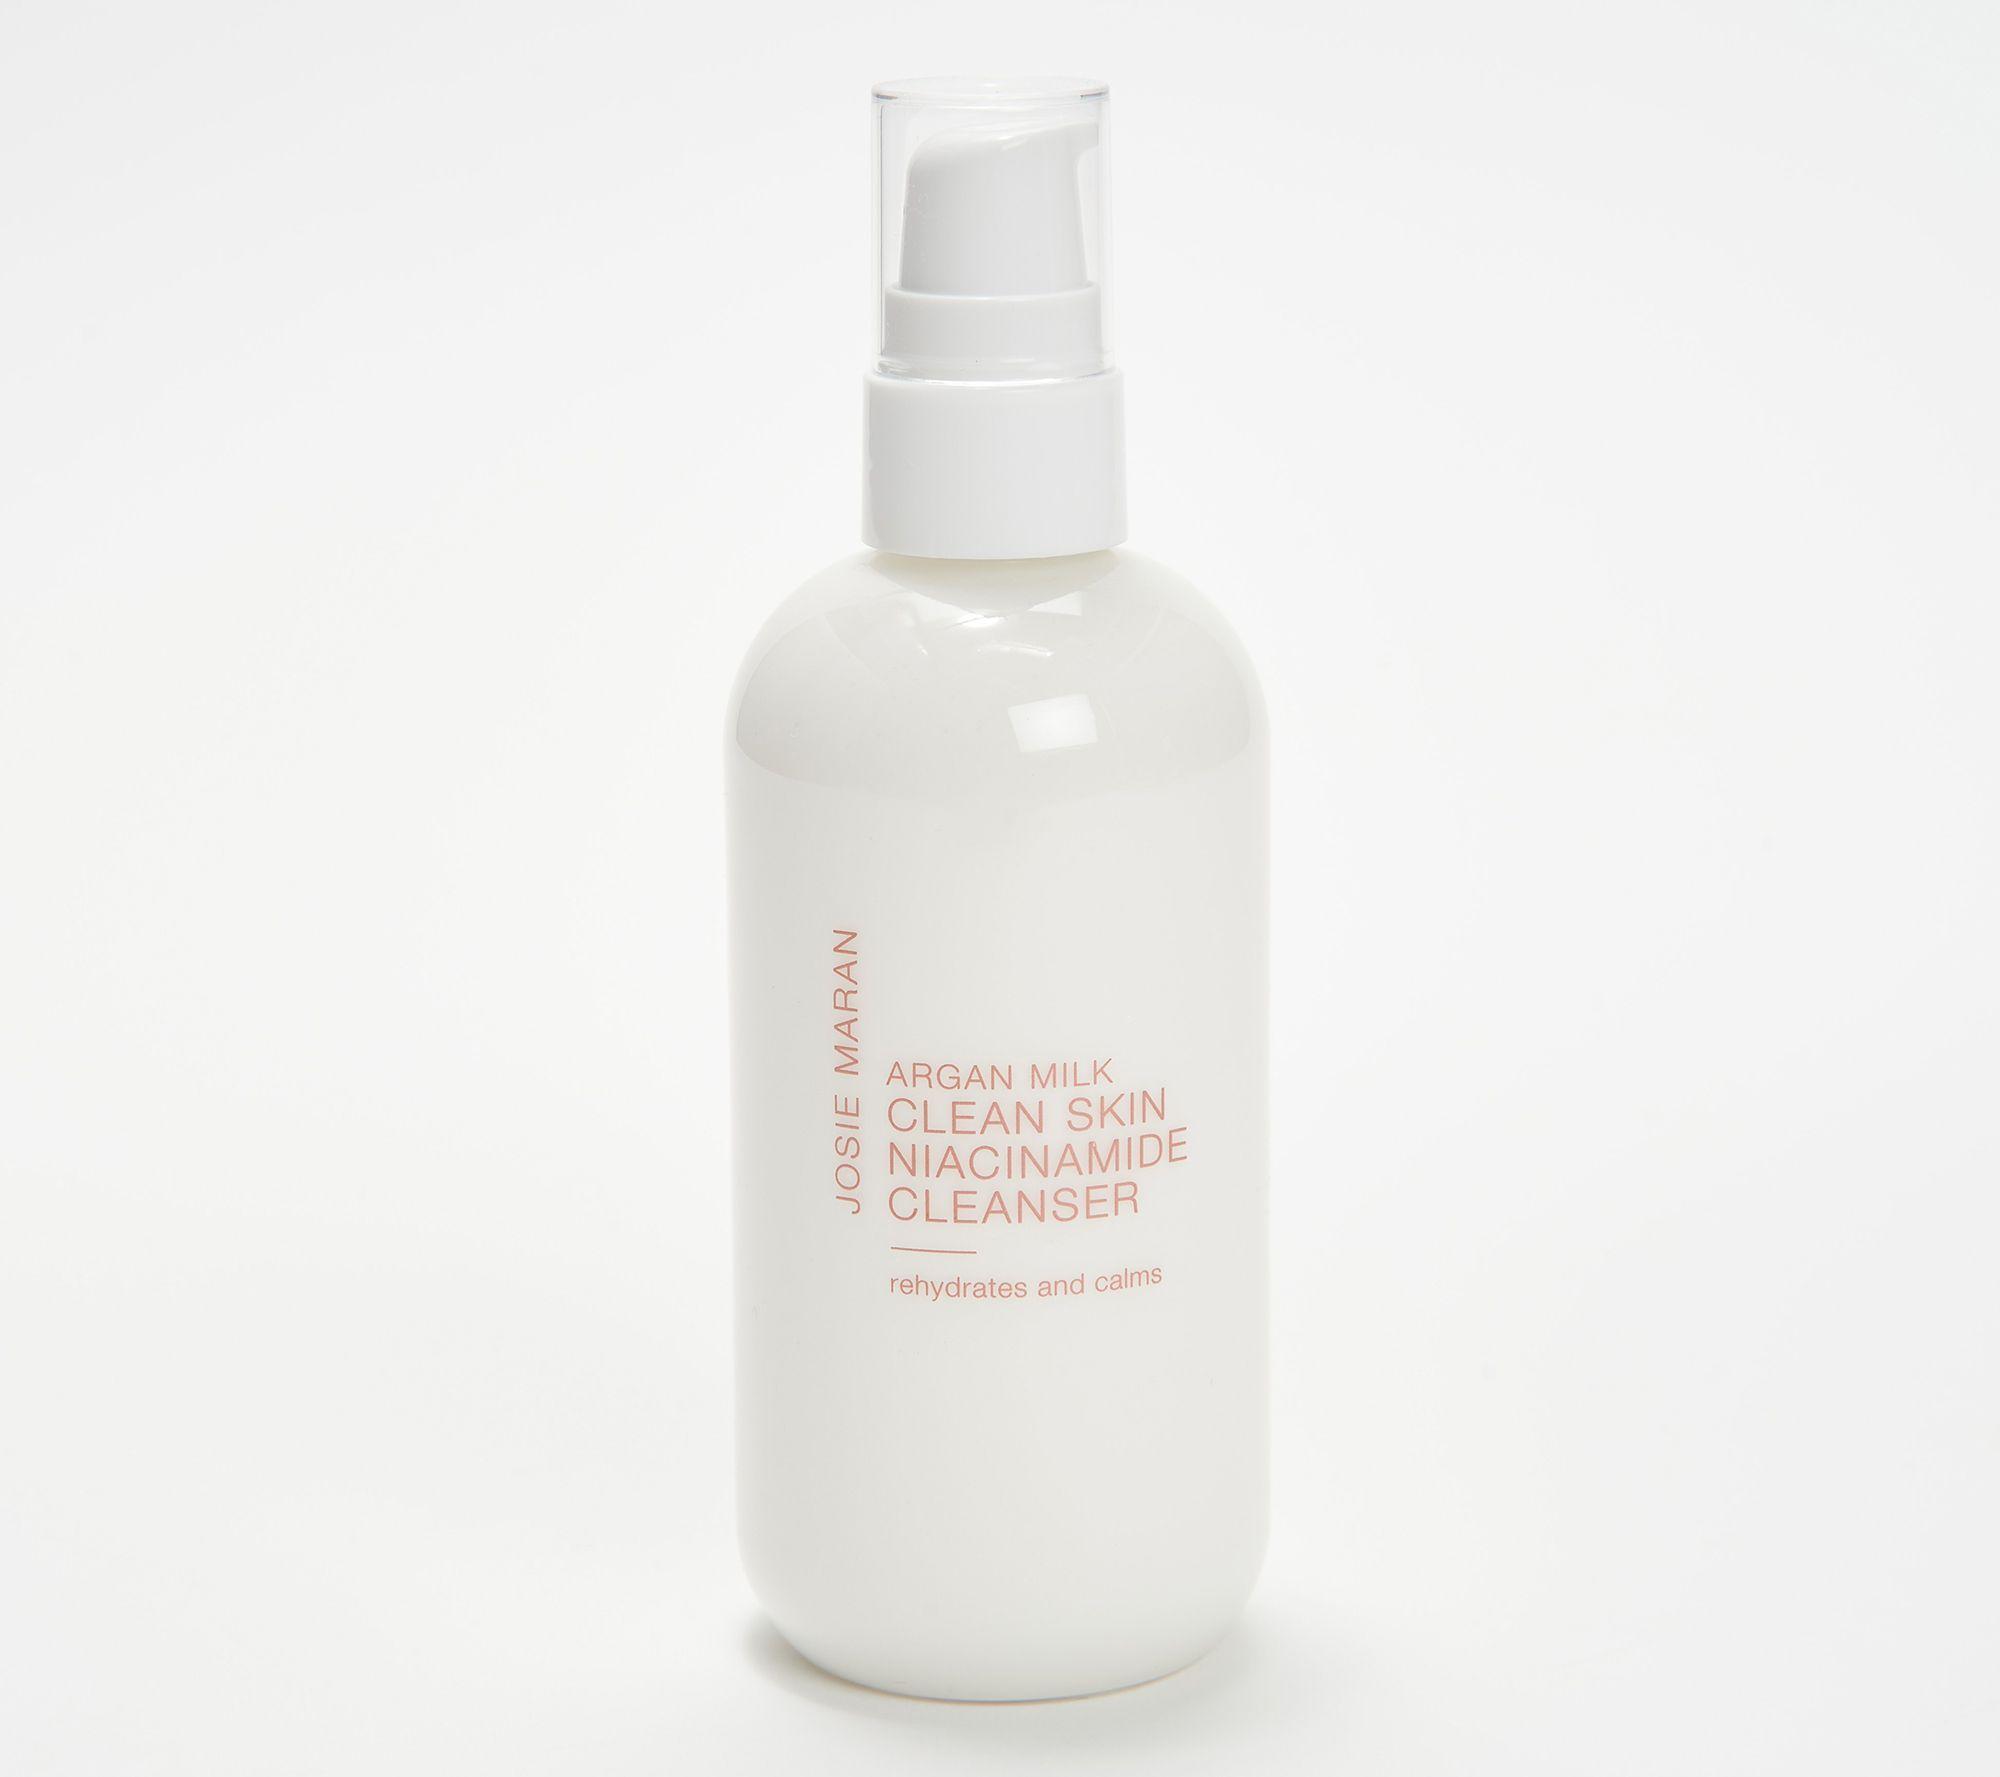 Josie Maran Super-Size Argan Milk Niacinamide Cleanser